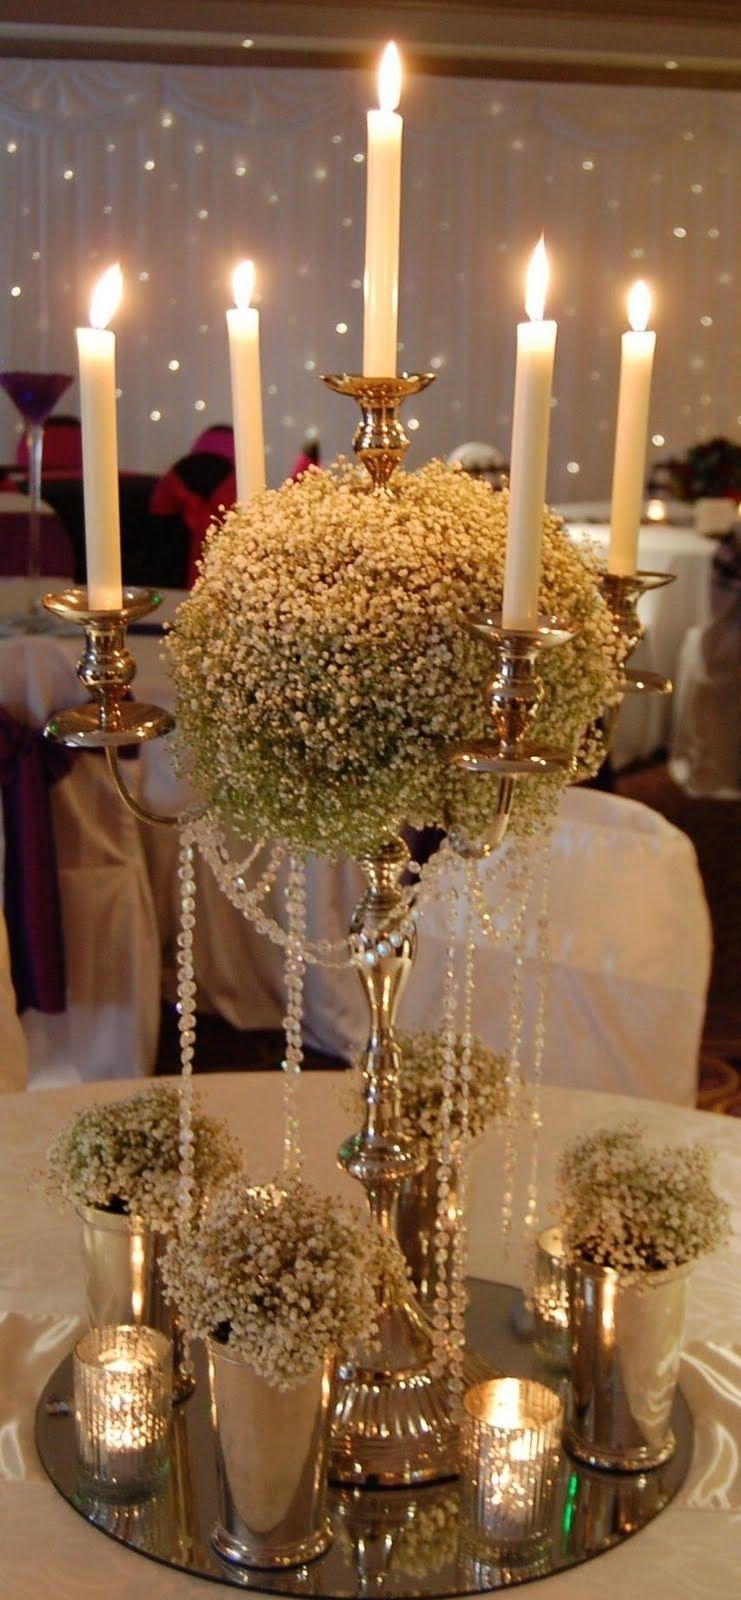 Candelabra with gypsophila Candelabra wedding